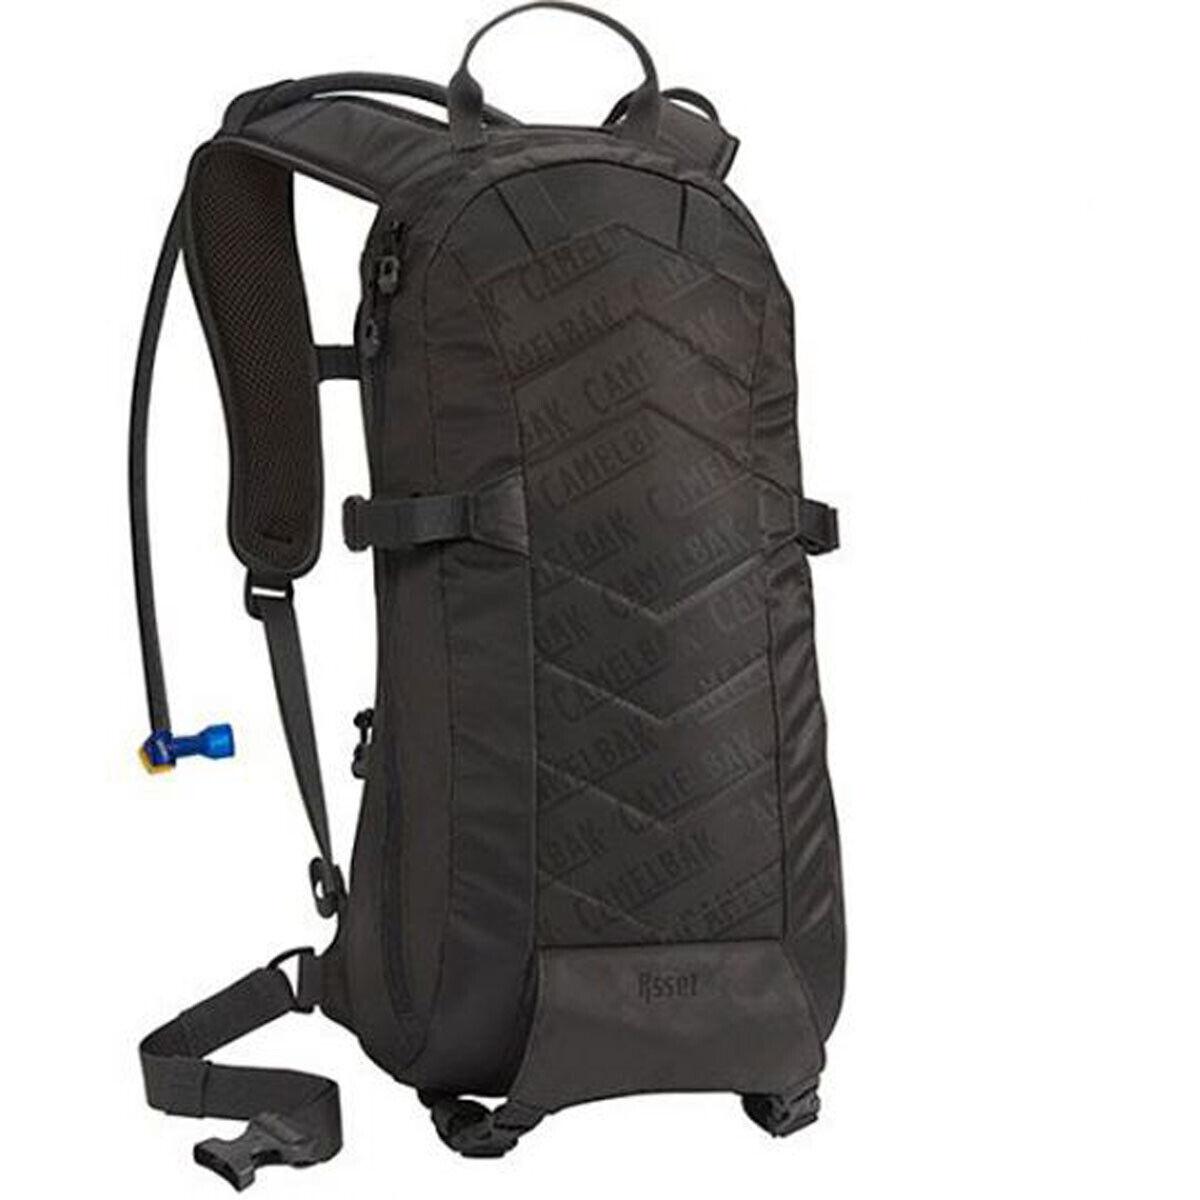 CamelBak Asset 70 oz MTB ciclismo Hydration Back Pack Peat Dark verde nuovo